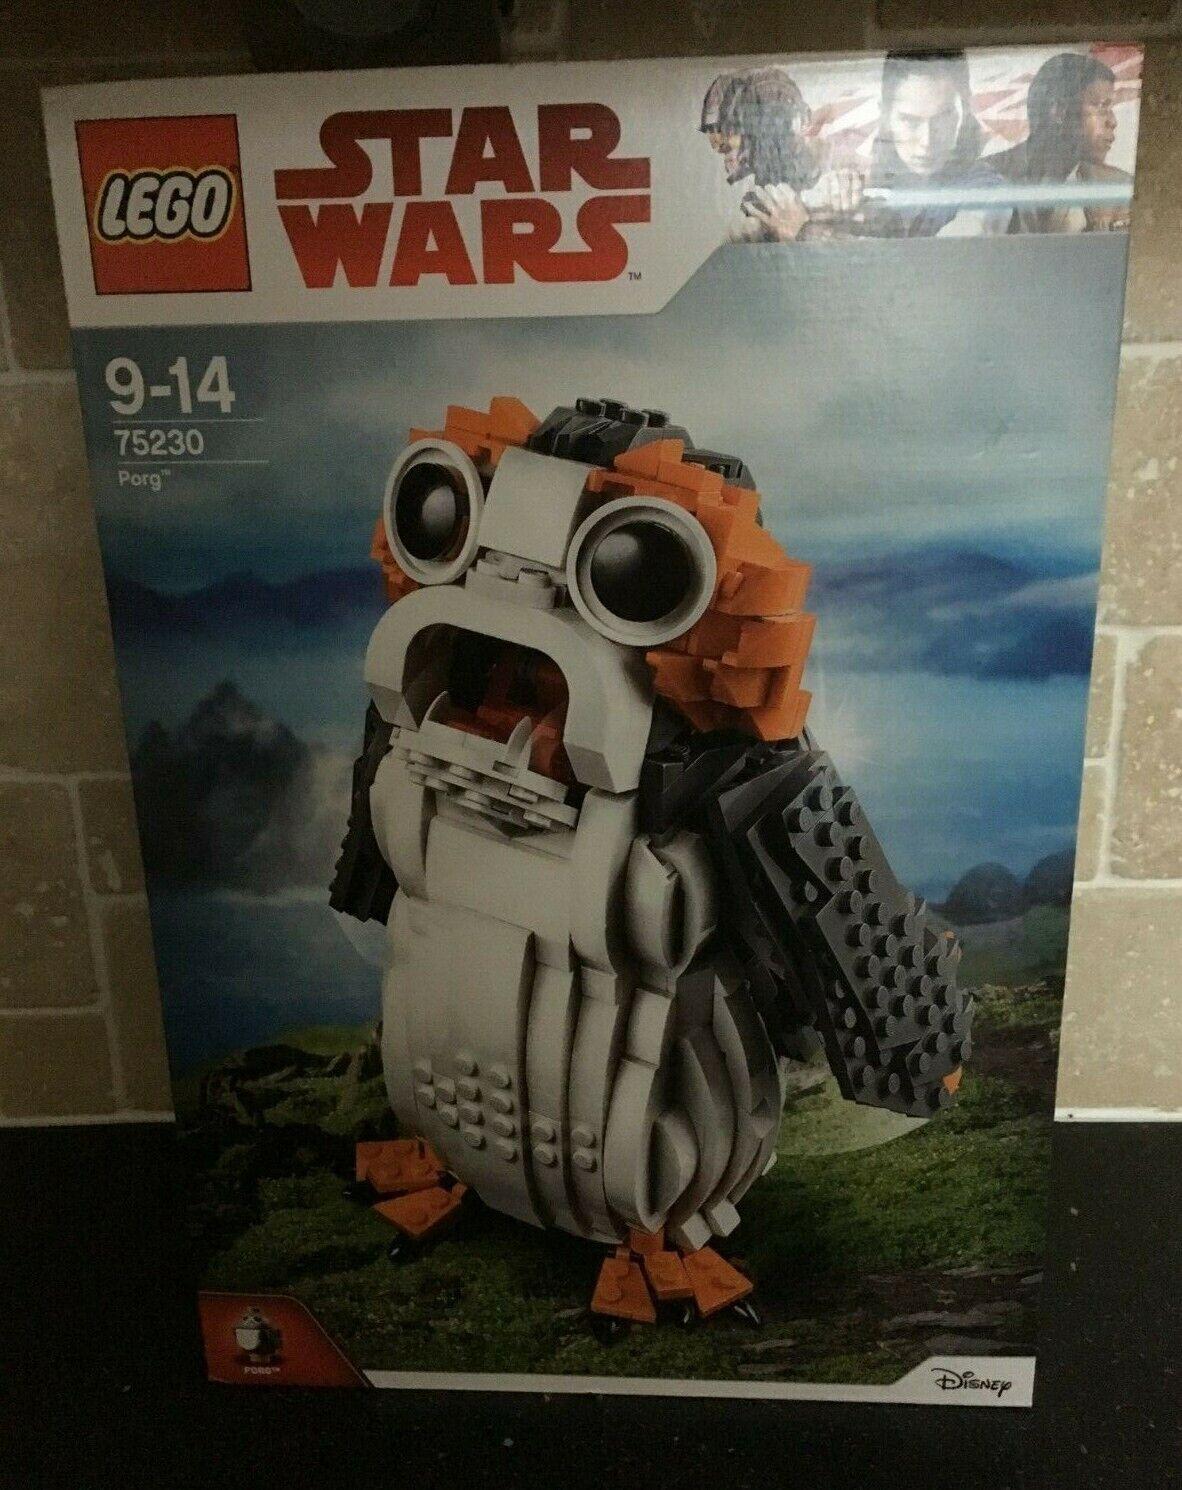 LEGO STAR WARS - 75230 Porg Brand New In Sealed Box